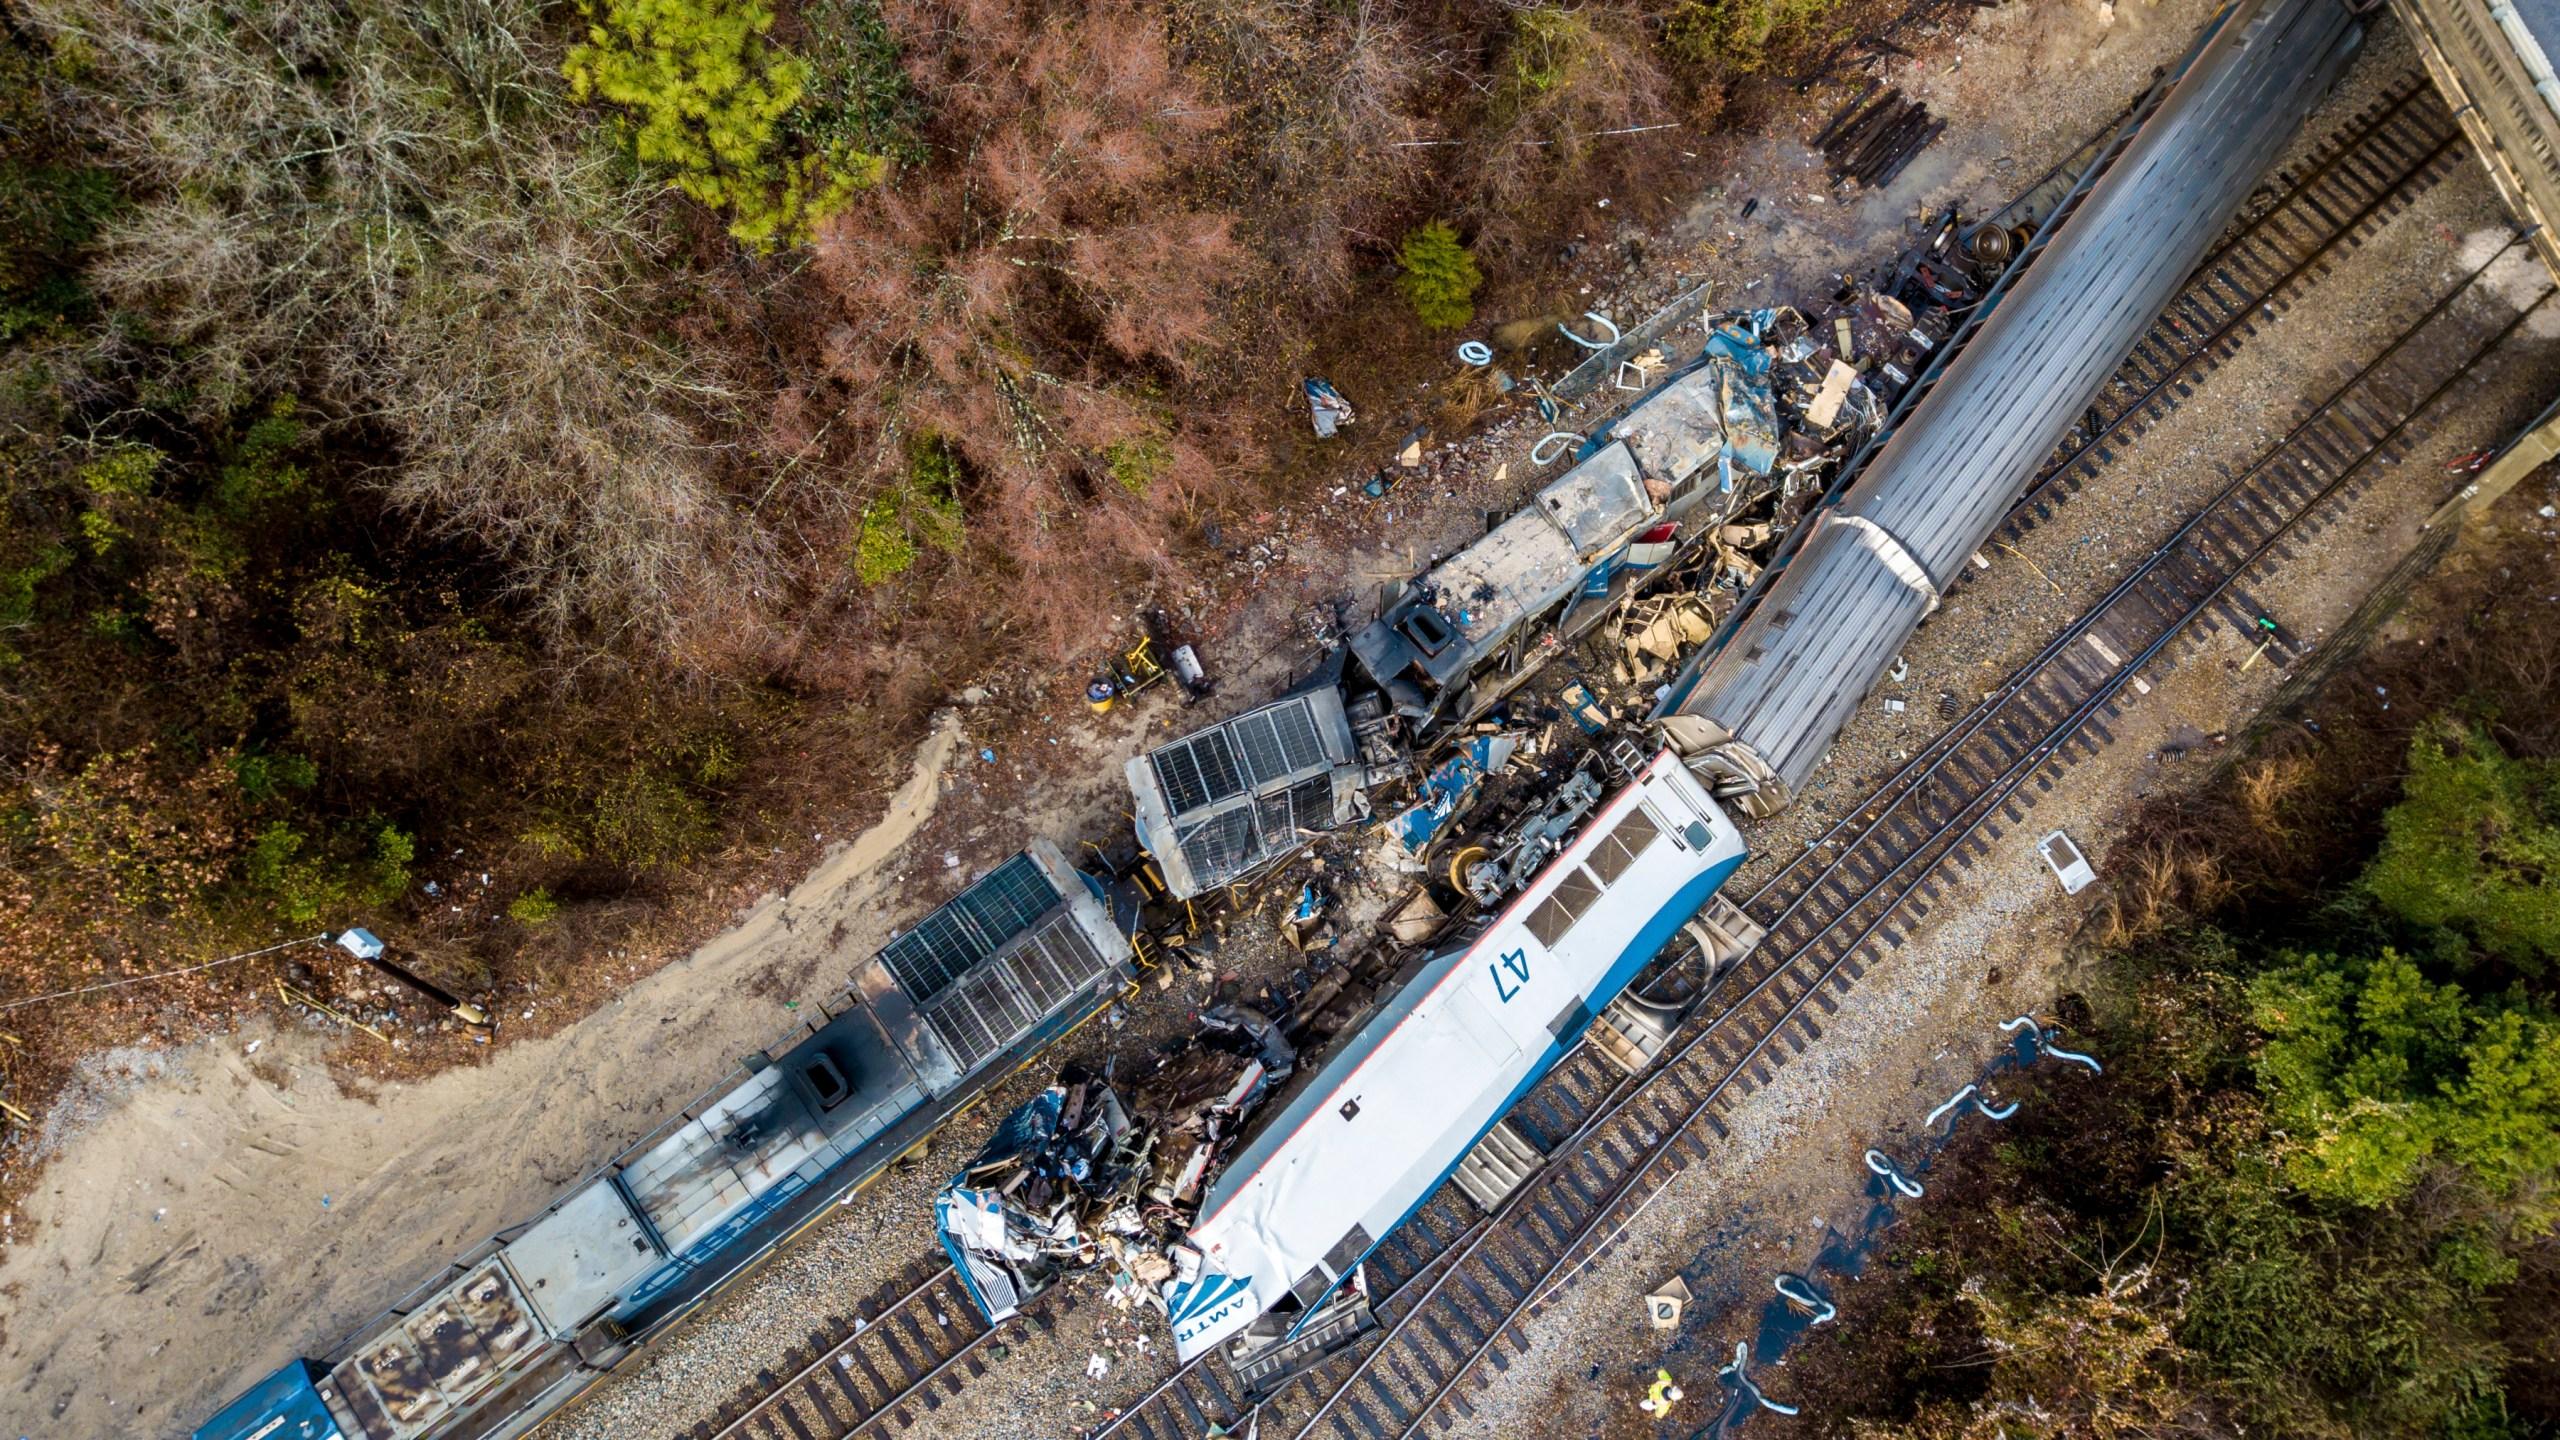 APTOPIX_Train_Crash_South_Carolina_10573-159532.jpg31561213